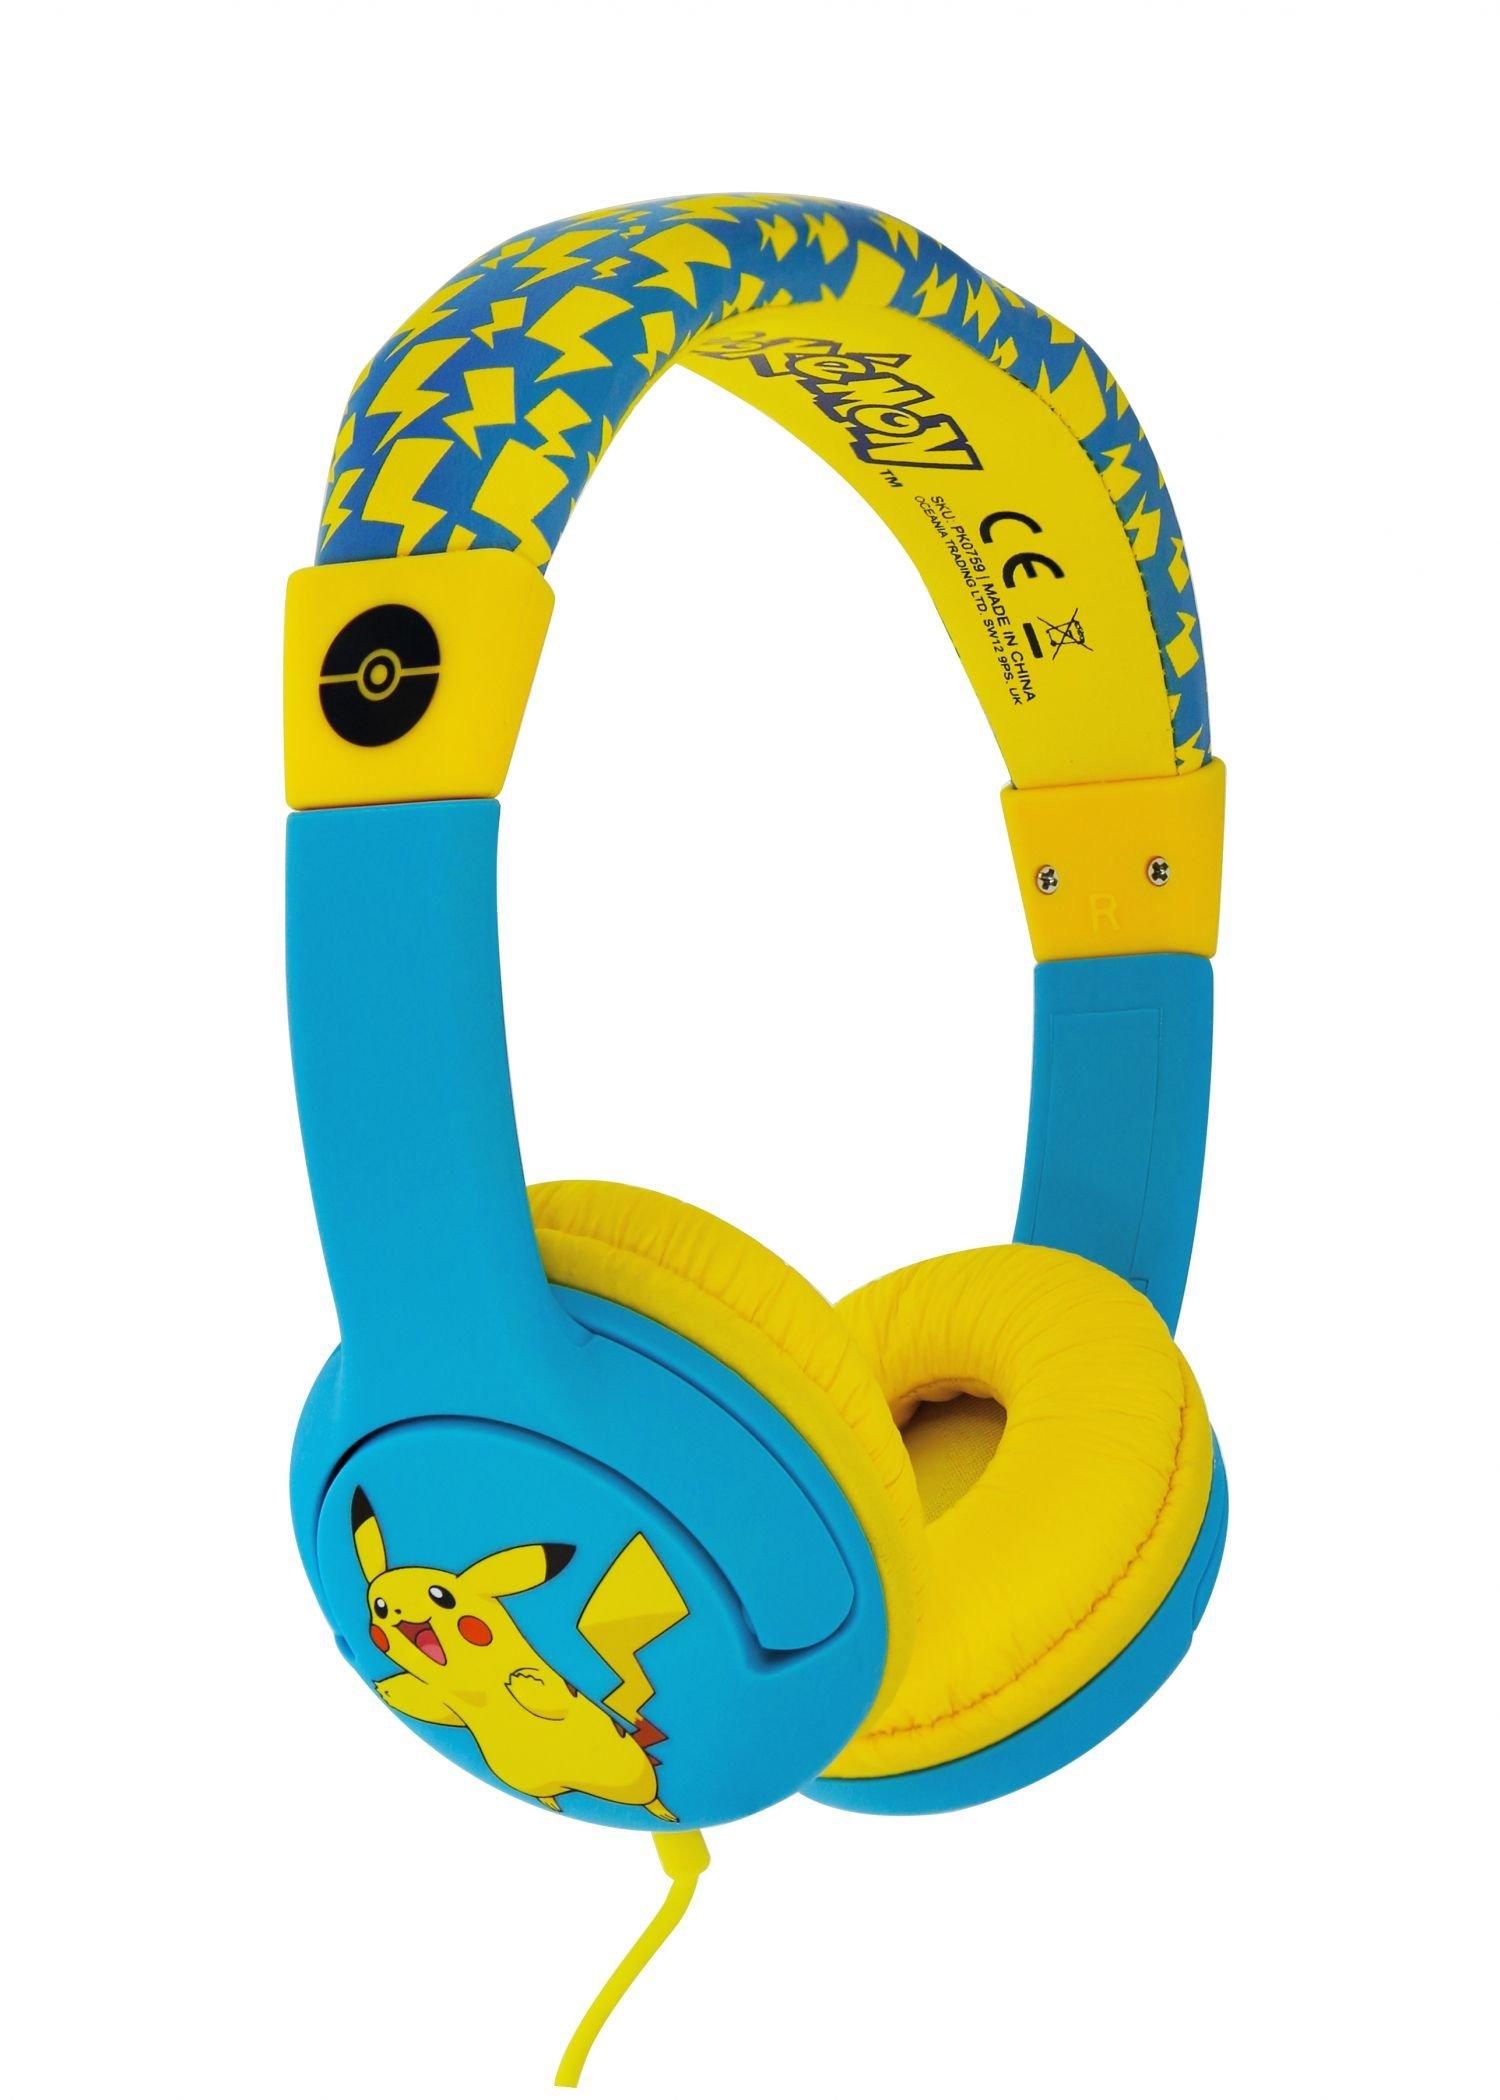 OTL - Junior Headphones - Pokemon Pikachu (856541)